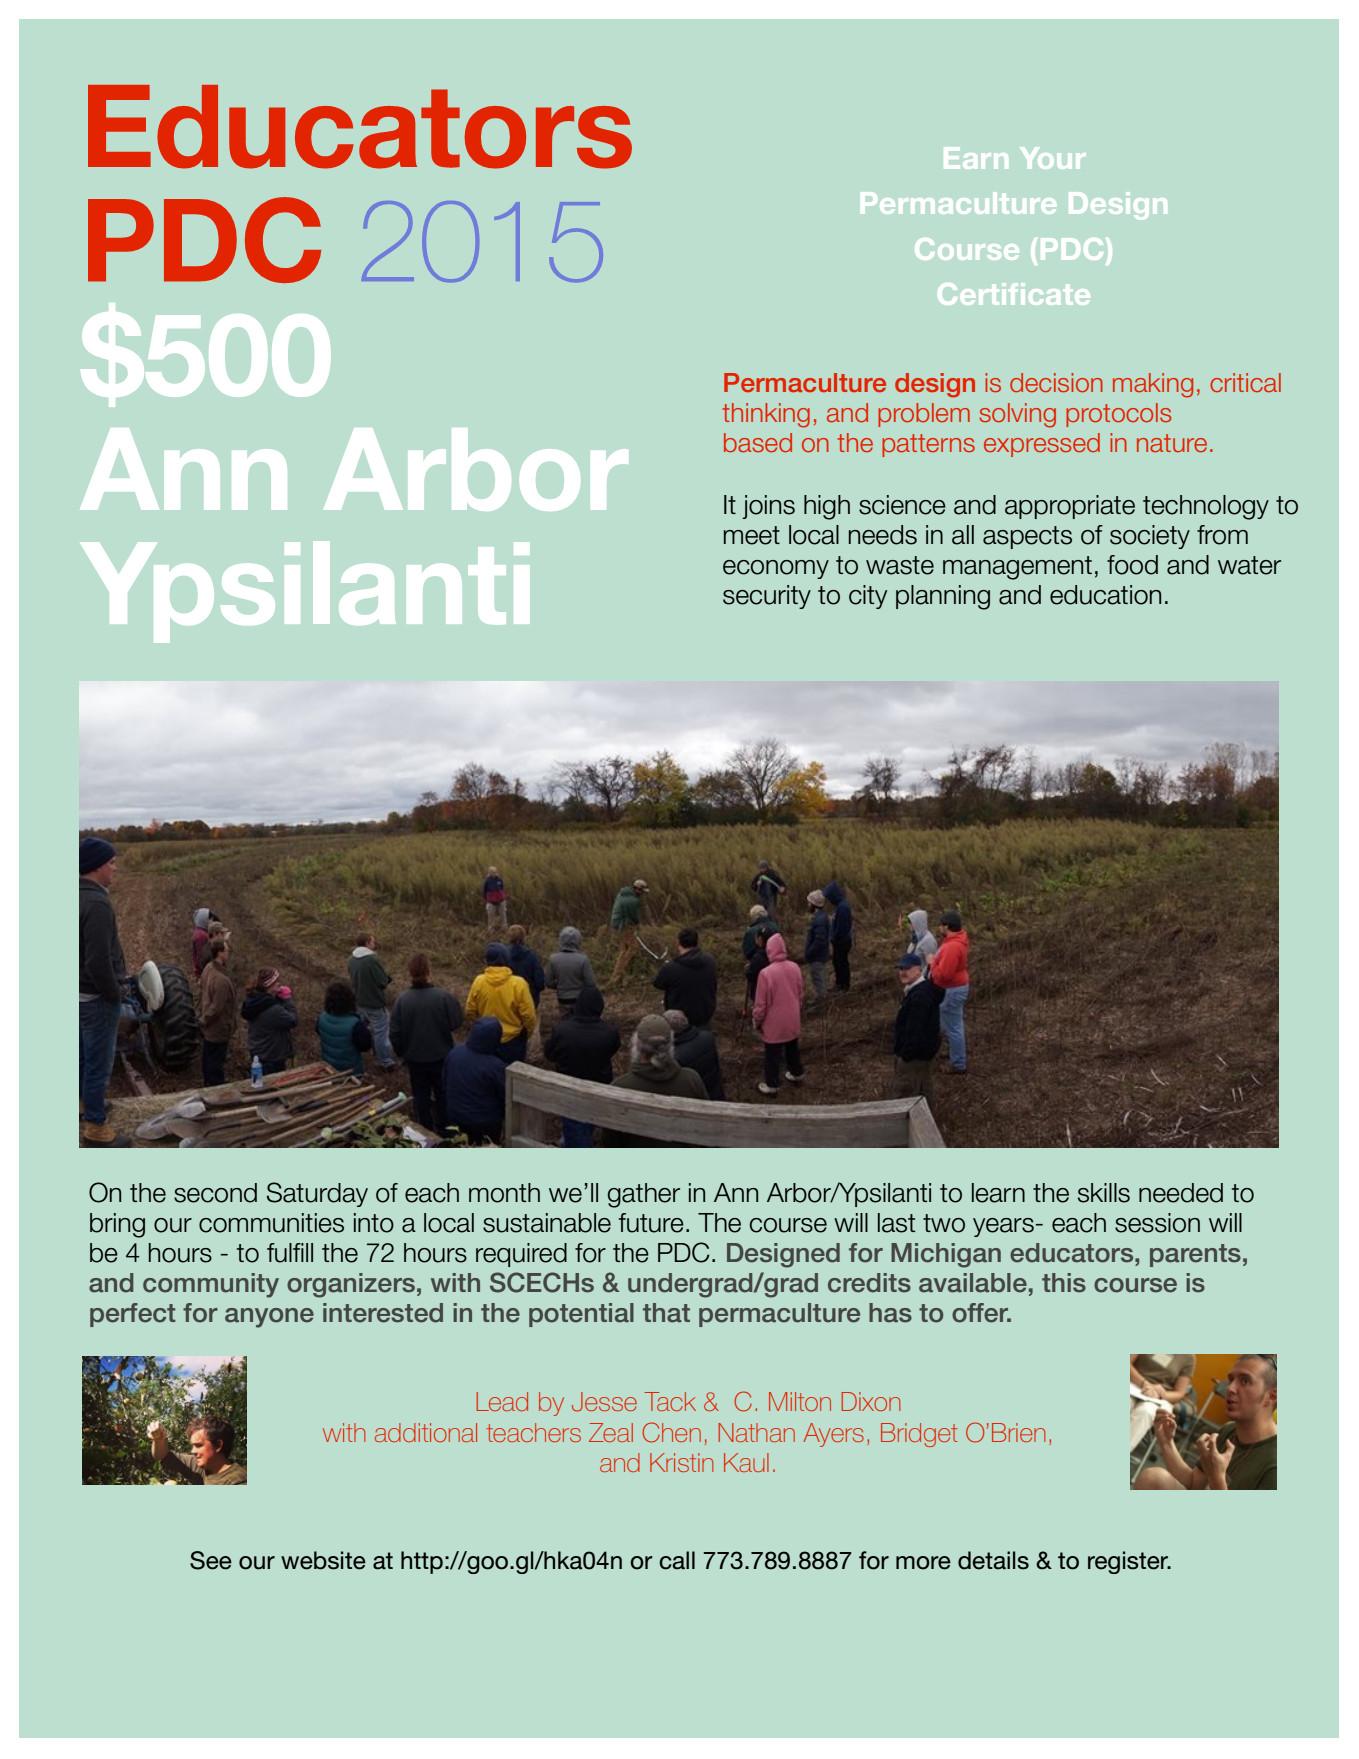 Educators PDC 2015 - Ann Arbor MI